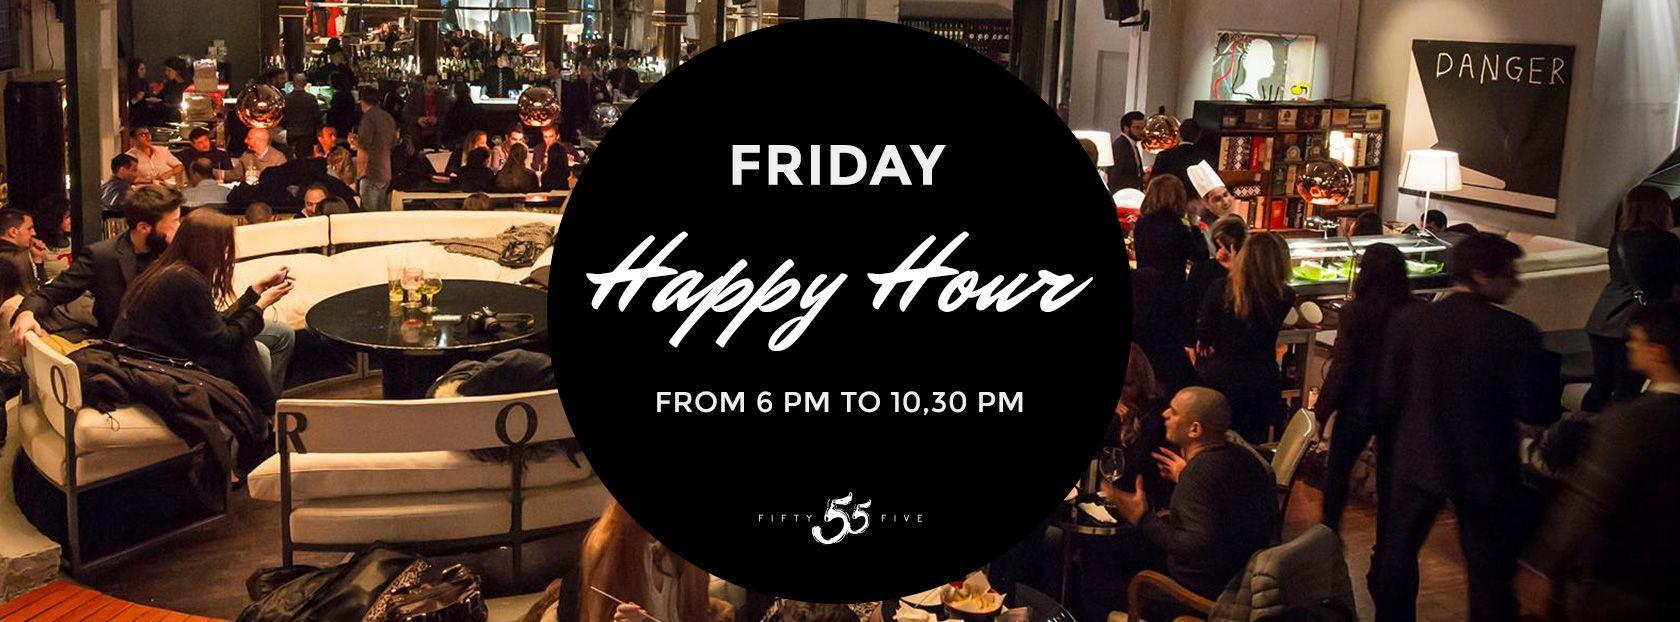 Friday - Happy Hour